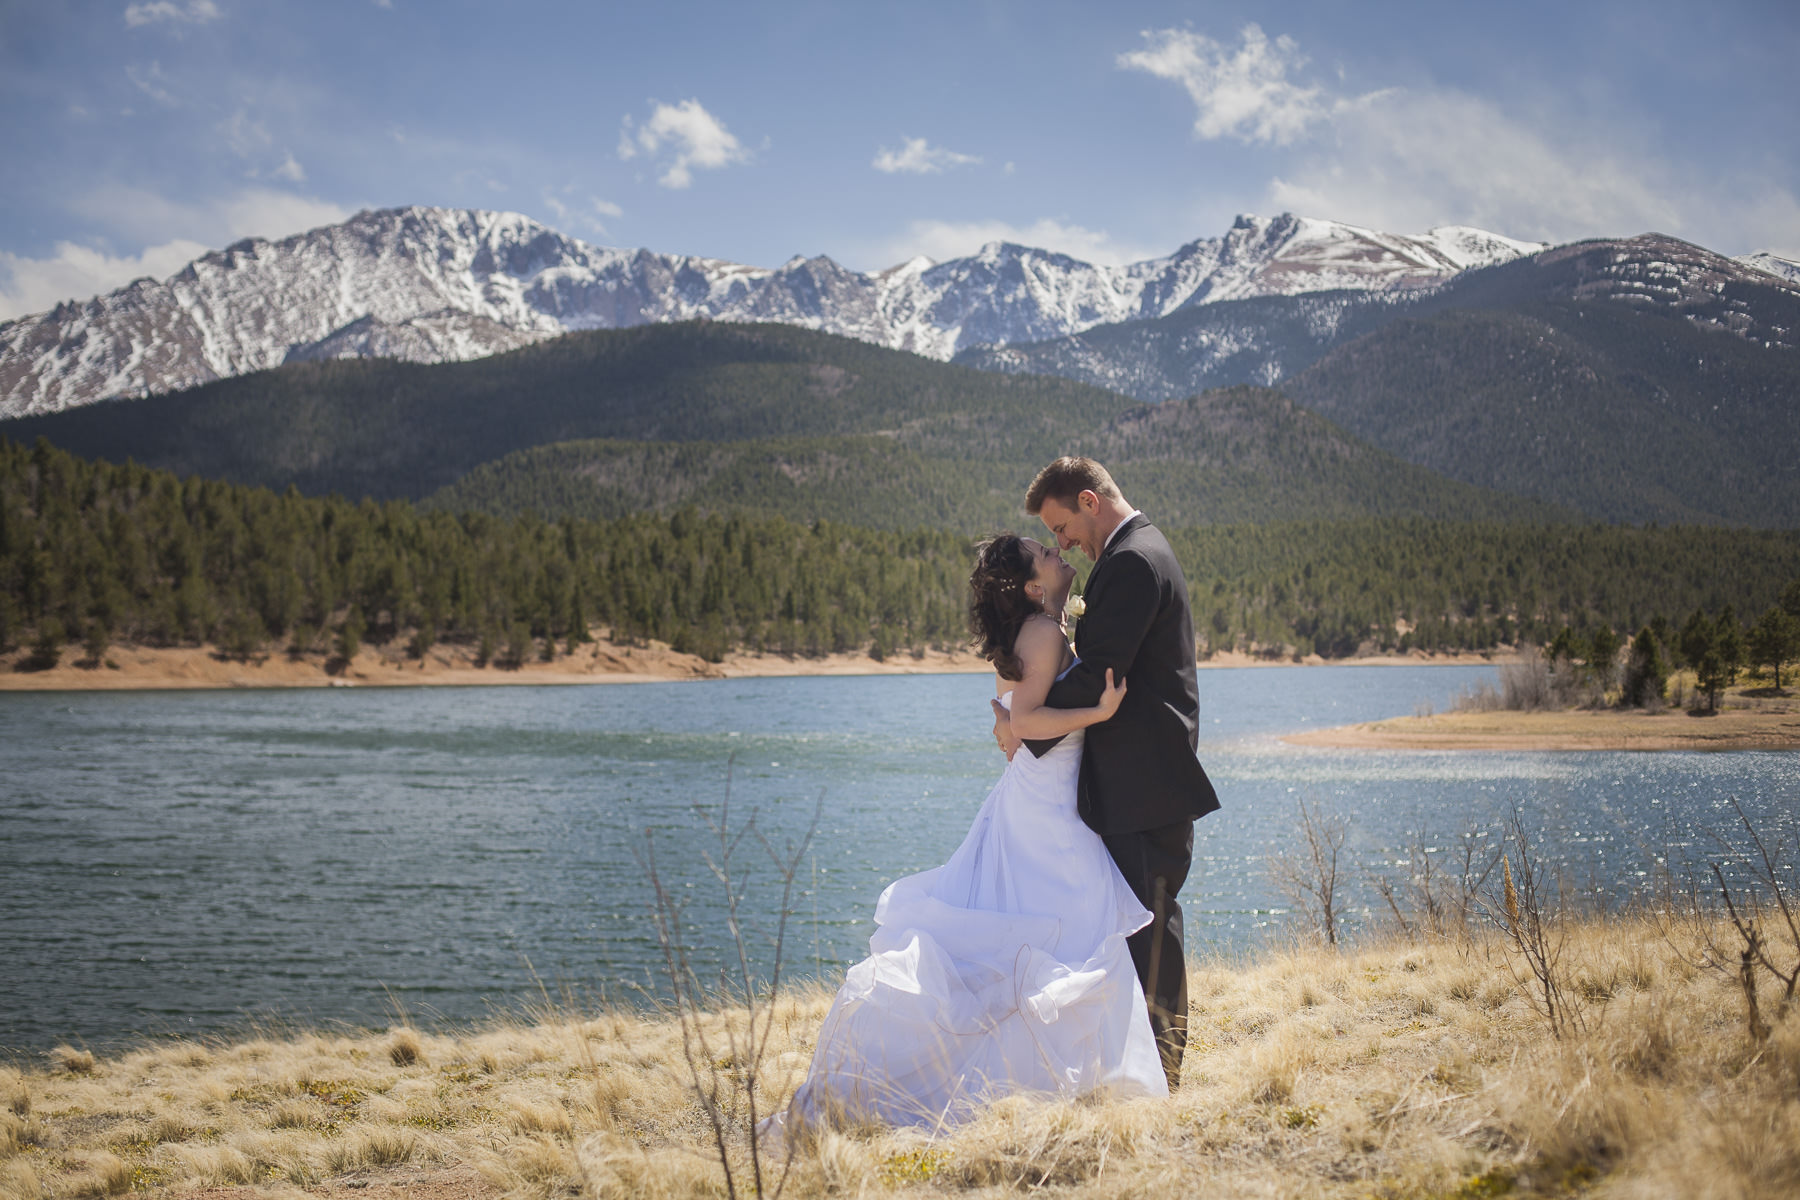 Pikes Peak wedding celebration